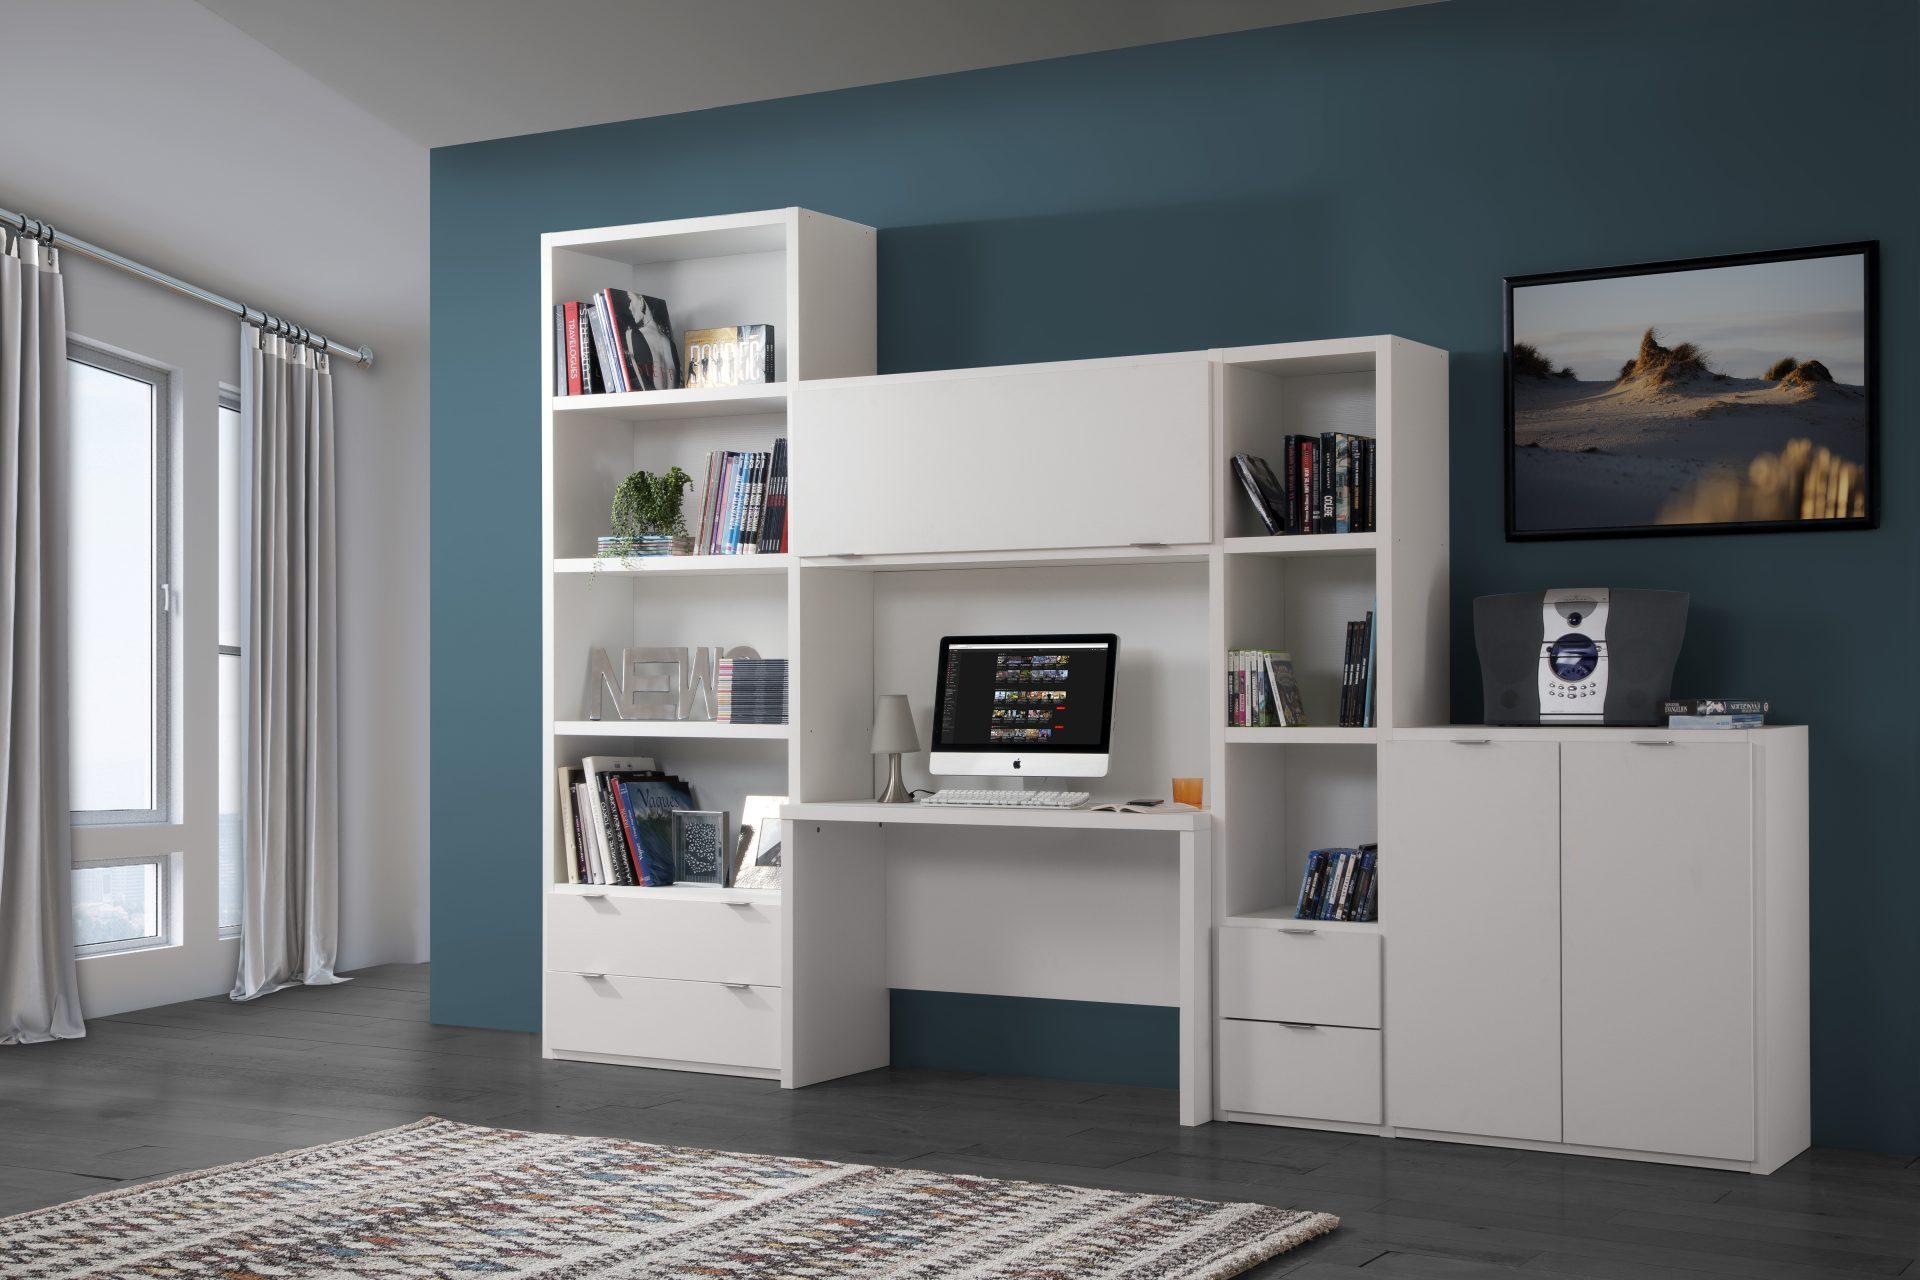 Meuble bureau collection manhattan meubles minet